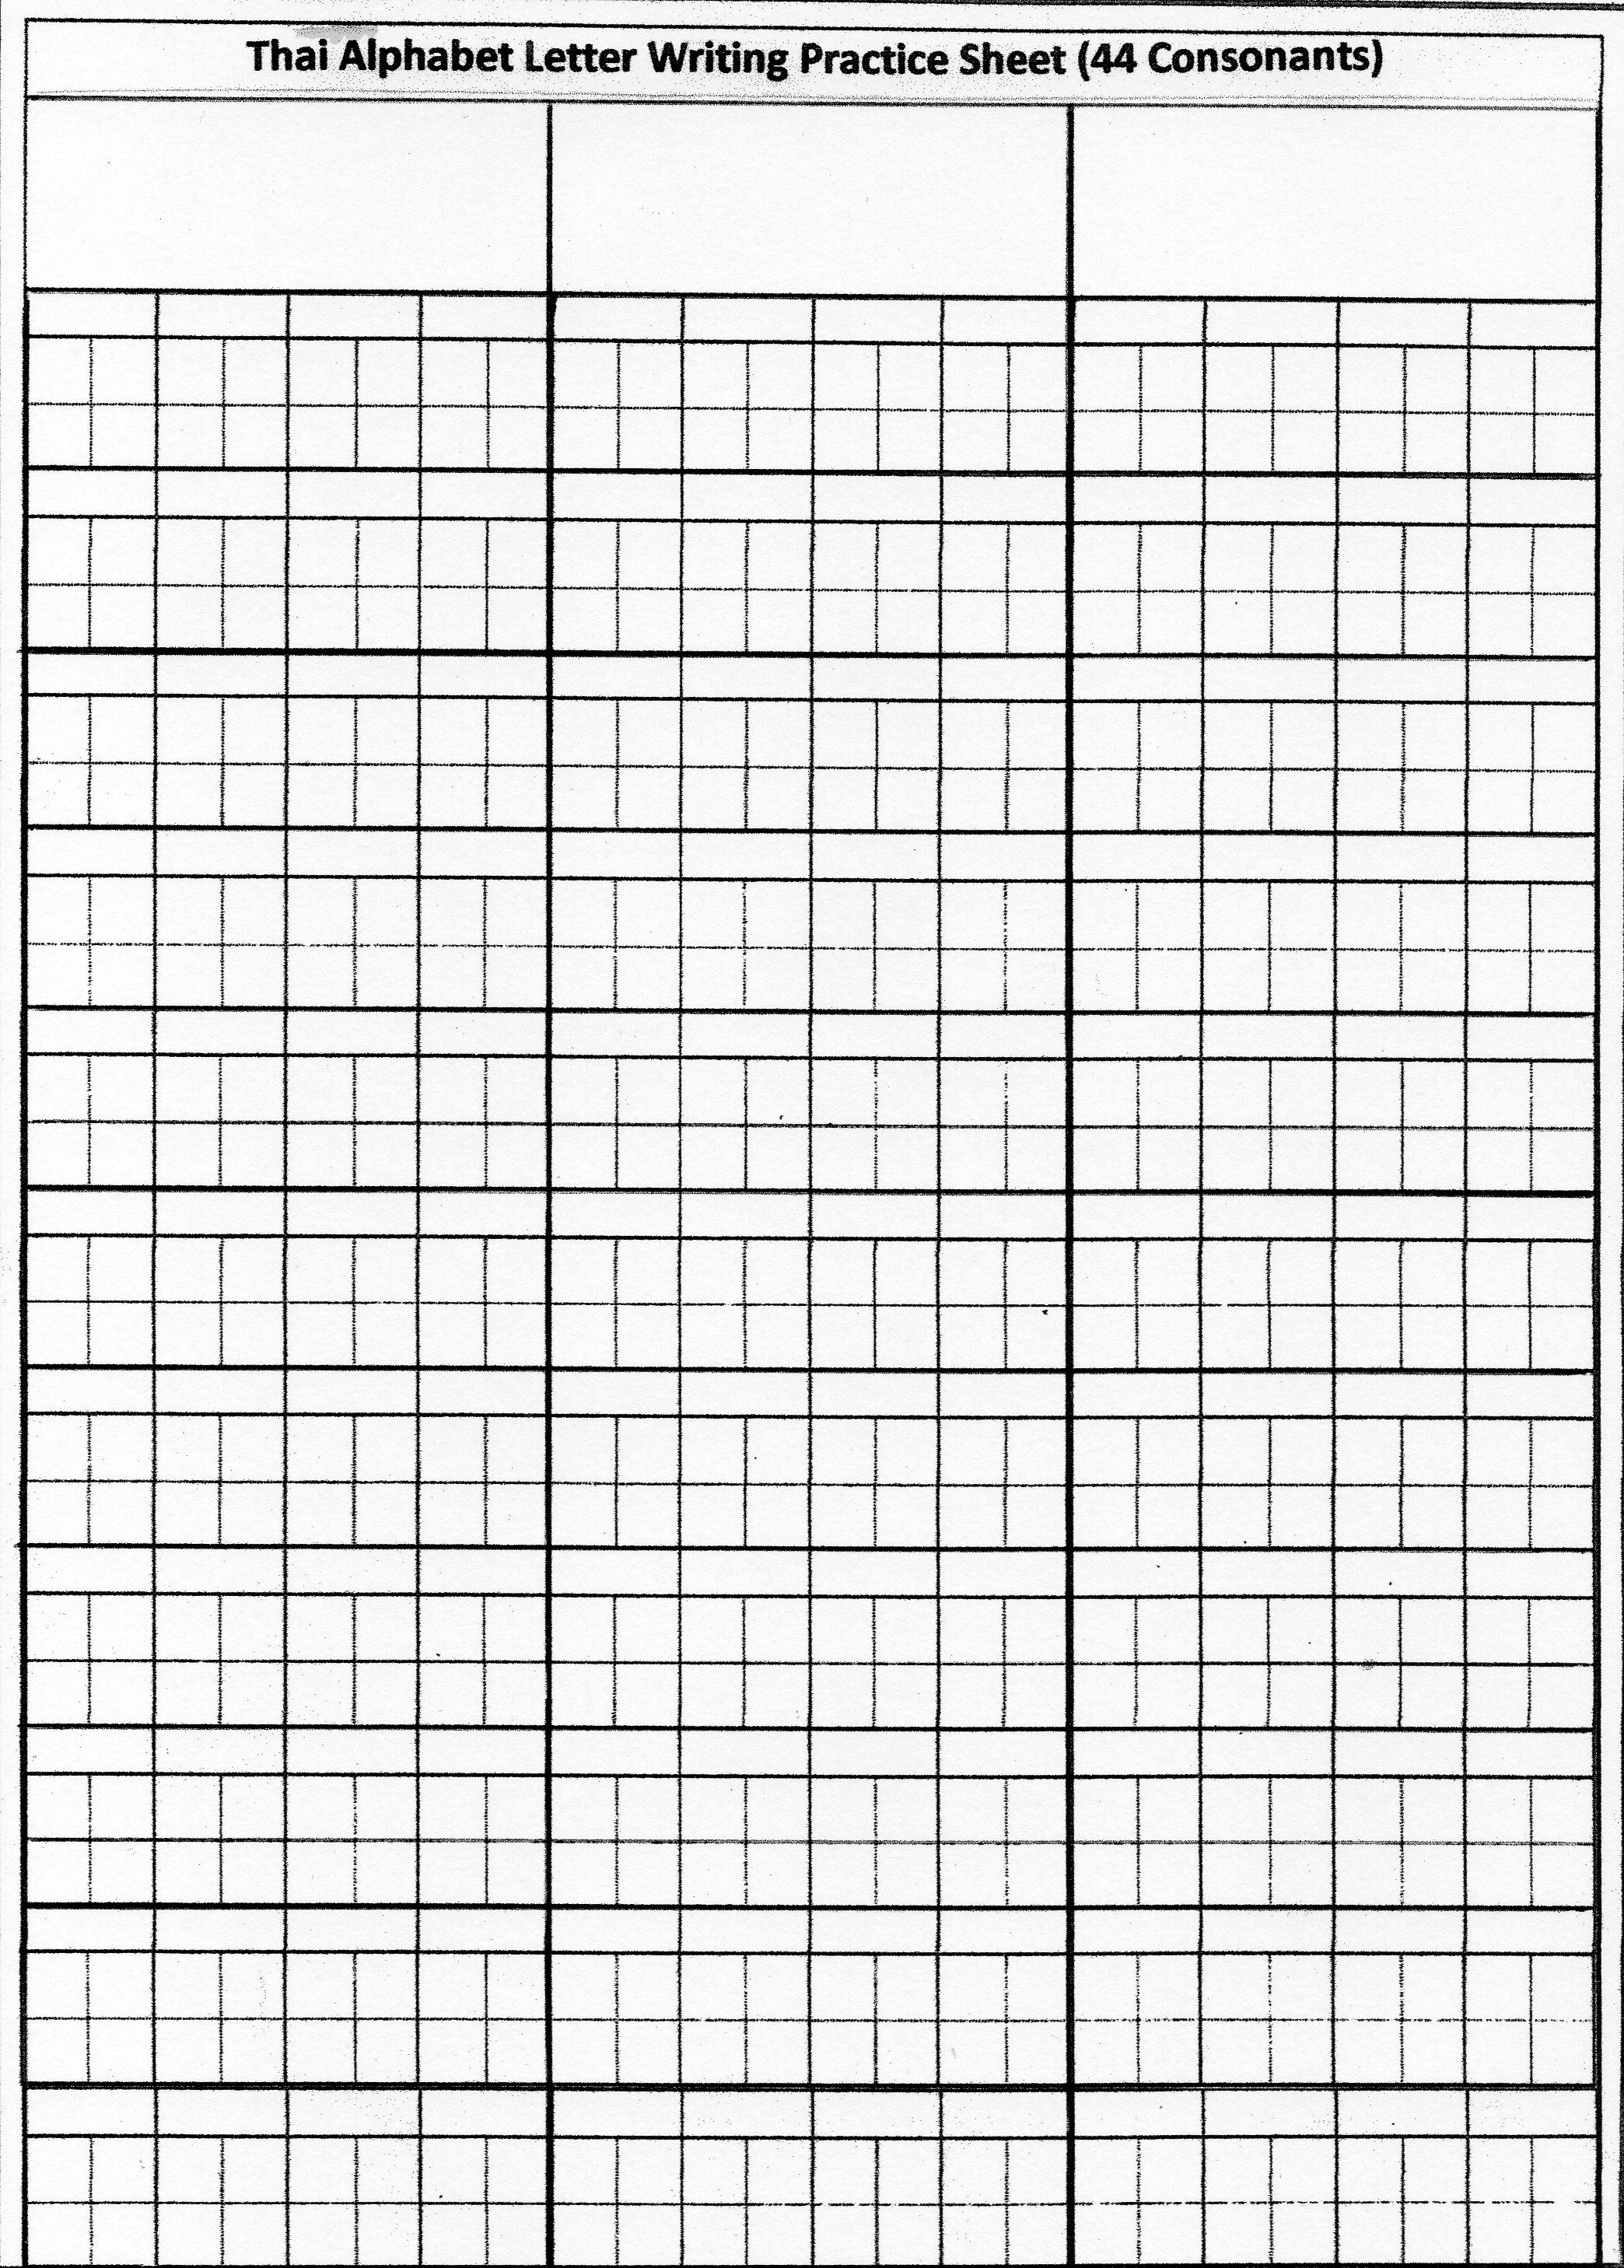 Thai Alphabet Letter Writing Practice Sheet For 44 Consonants Thai Alphabet Writing Practice Sheets Alphabet Letter Practice [ 2916 x 2088 Pixel ]